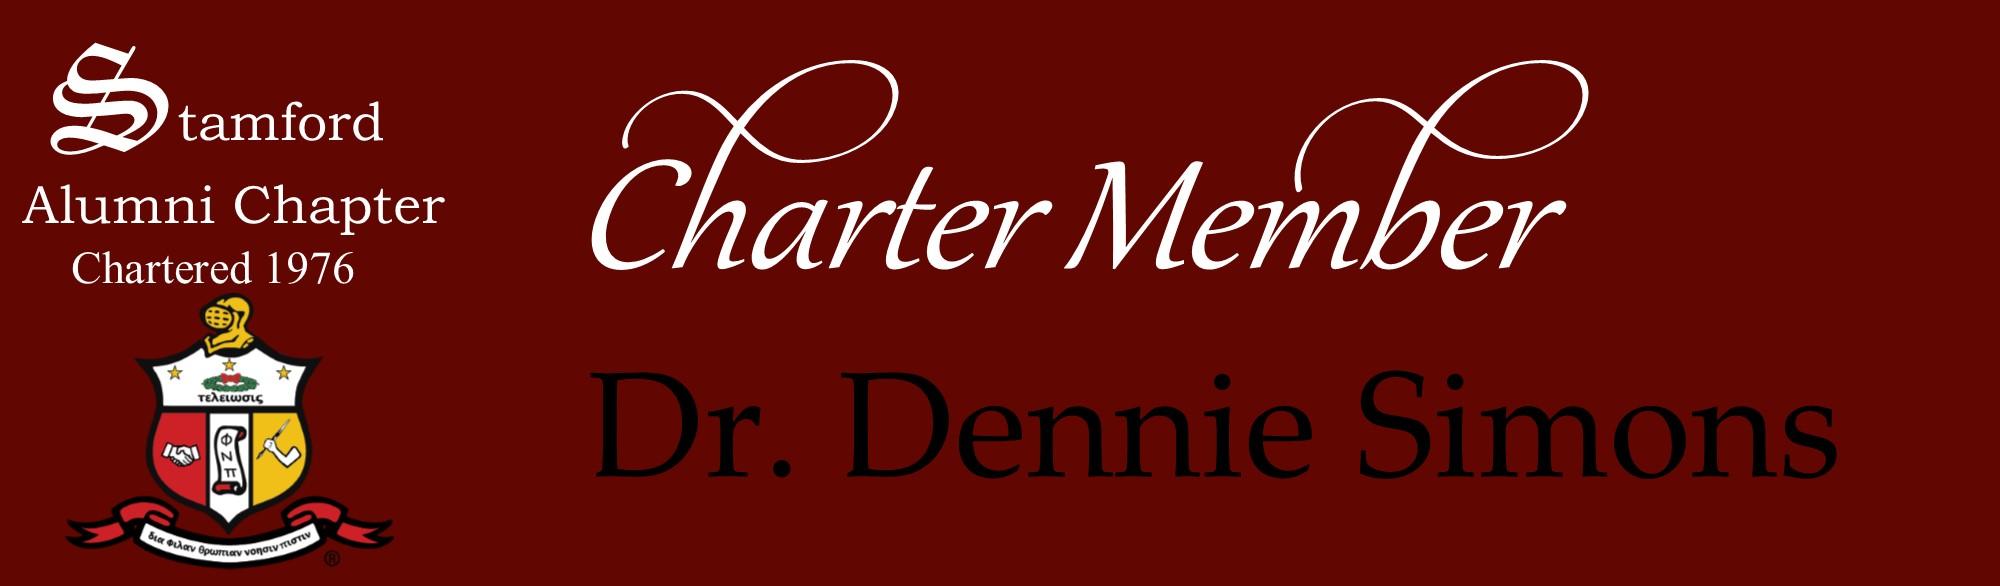 Stamford Alumni Chapter